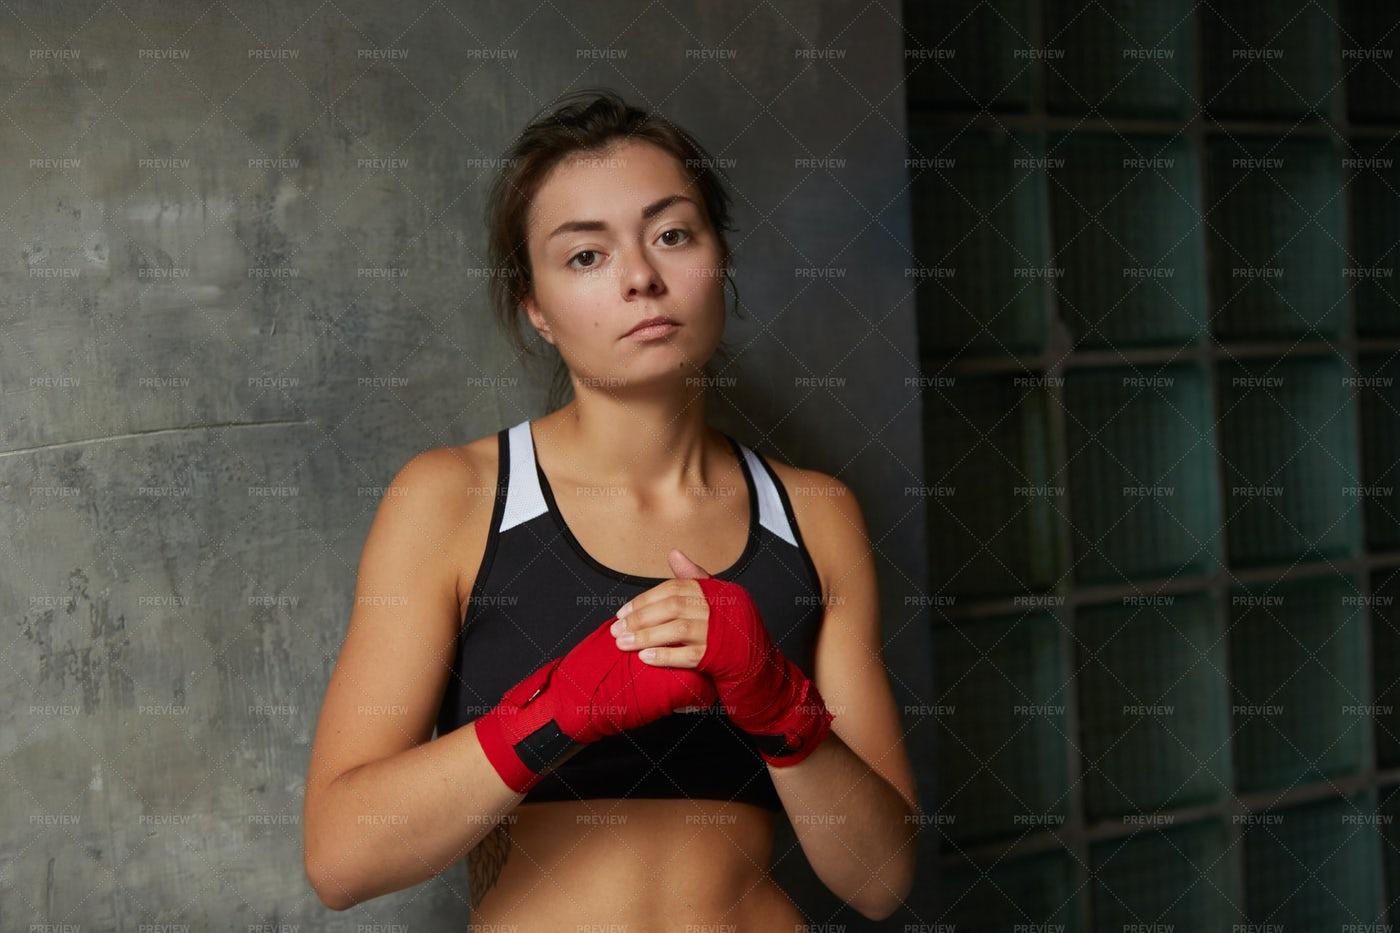 Tough Young Woman Looking At Camera: Stock Photos